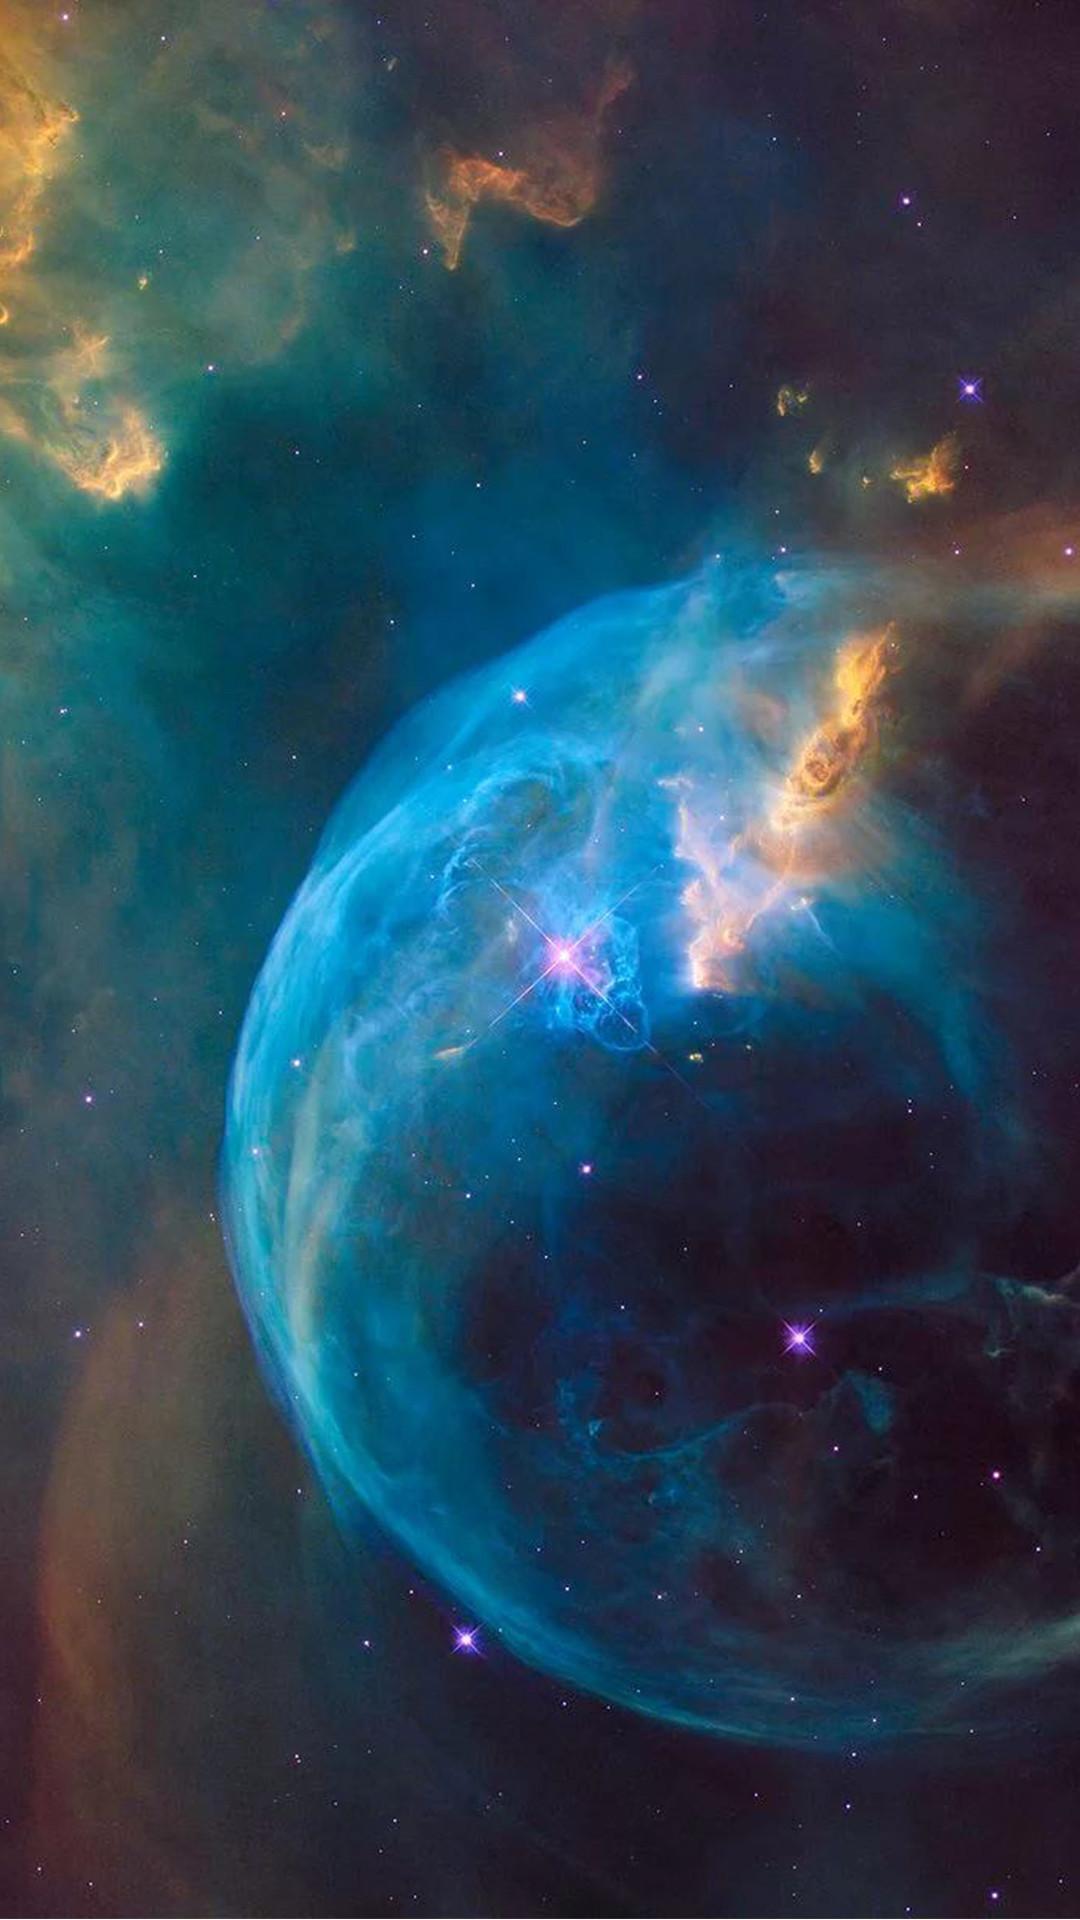 Supernova Blue Bubble Explosion Hubble Android Wallpaper